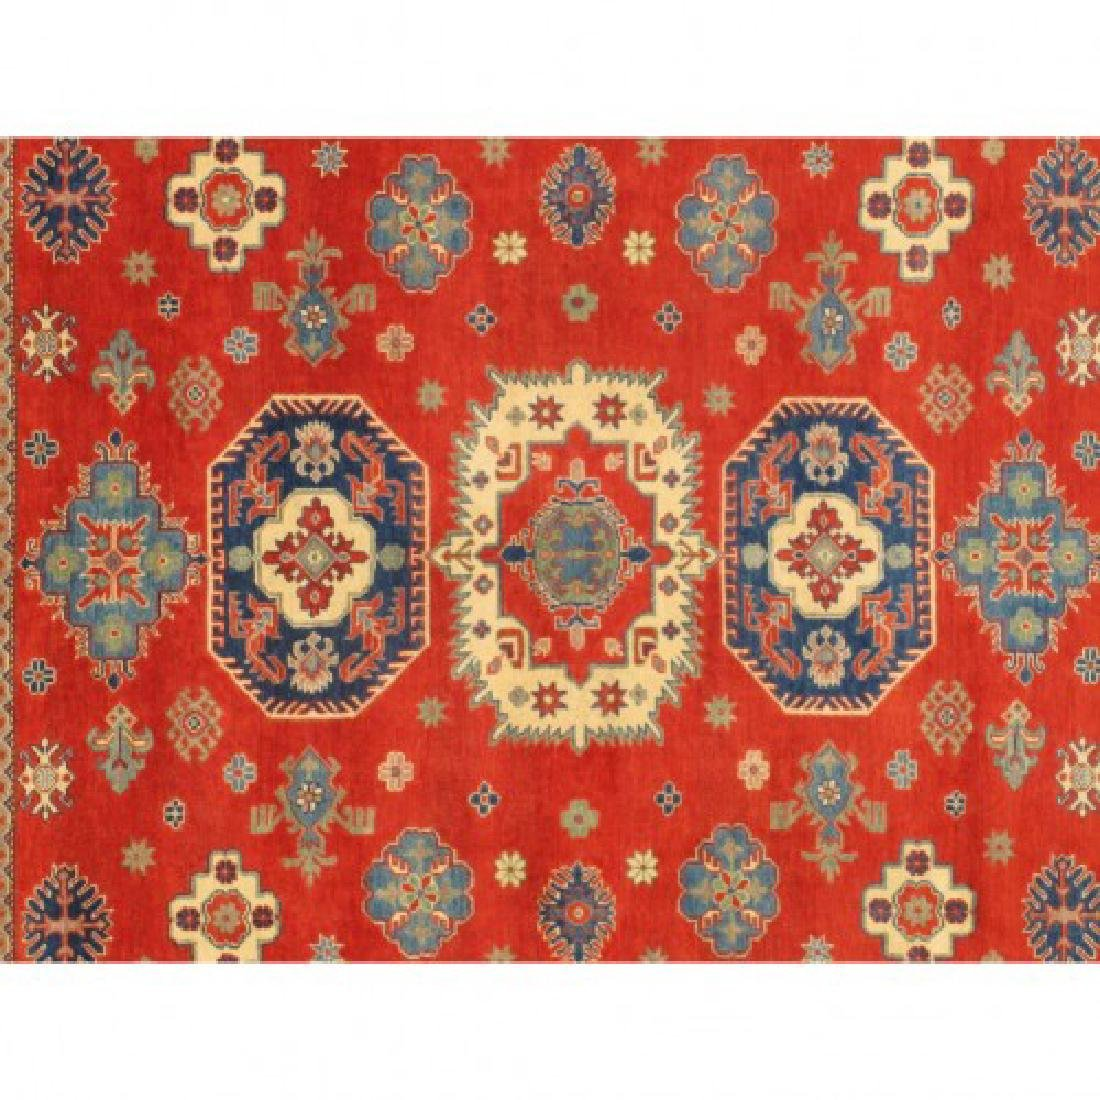 Hand Knotted Wool Kazak Rug 9x10 - 6